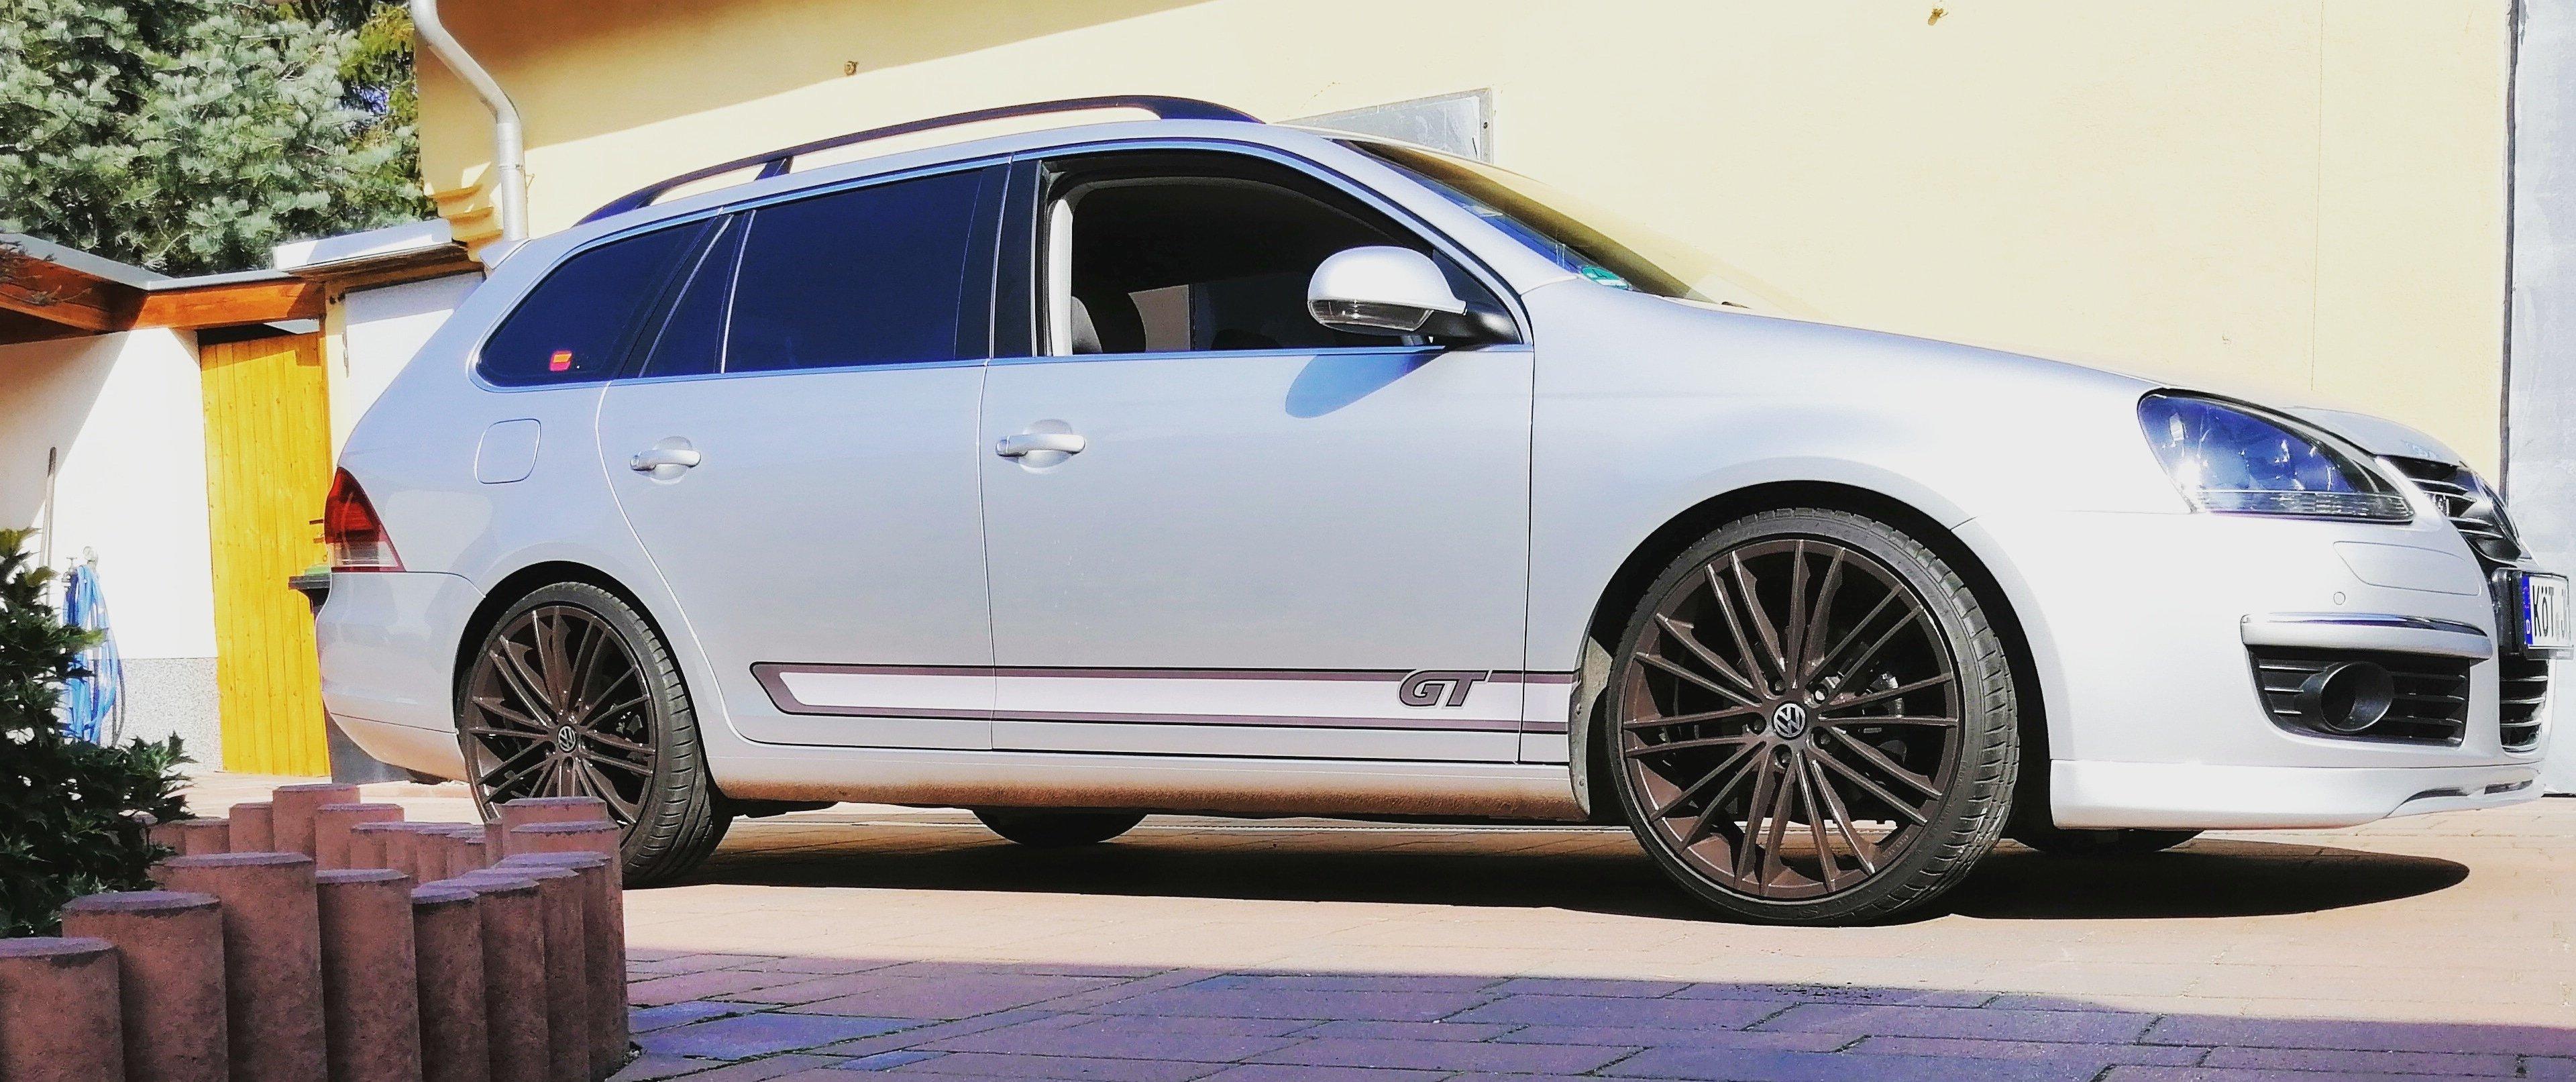 VW – Golf Variant – ORIGINAL AUDI – Bavaria Q5 – Braun – 19 Zoll